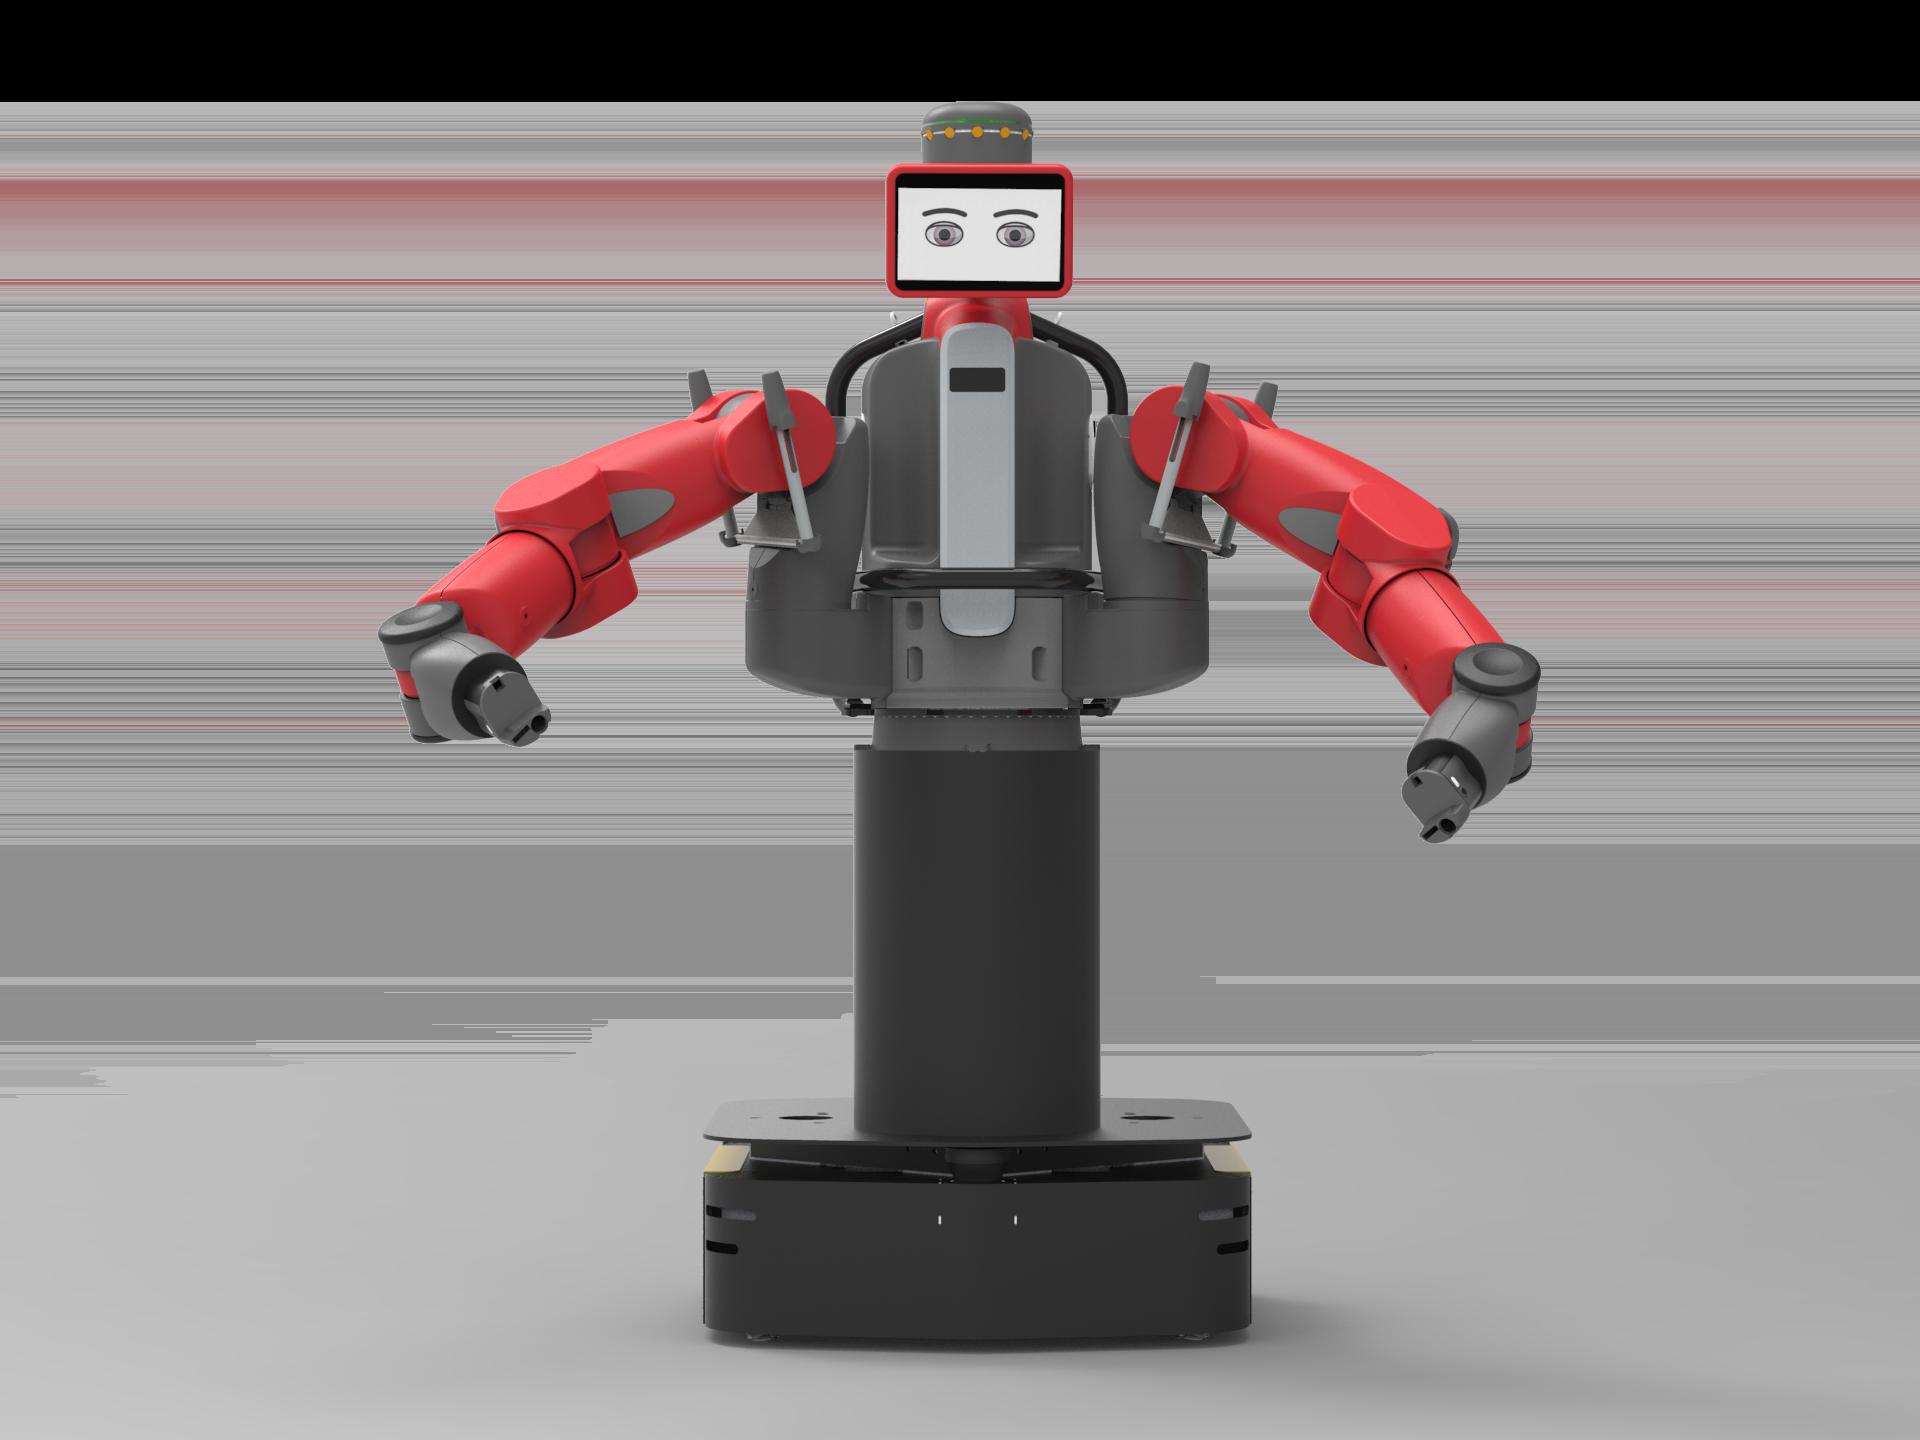 Ridgeback Omnidirectional Mobile Manipulation Robot